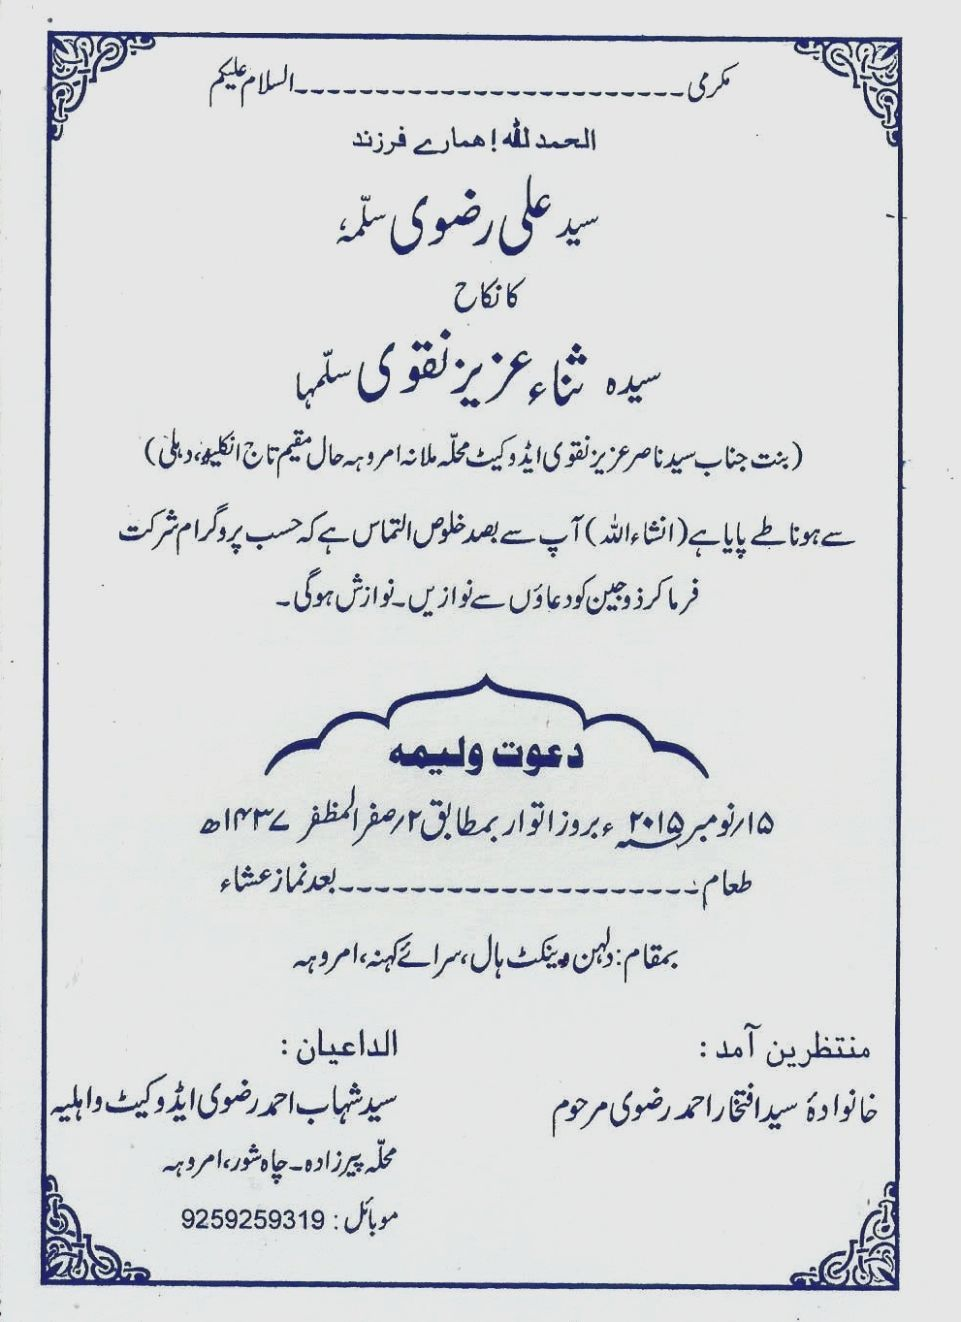 10 Invitation Card Urdu Wedding Invitation Card Design Wedding Card Writing Invitation Card Sample